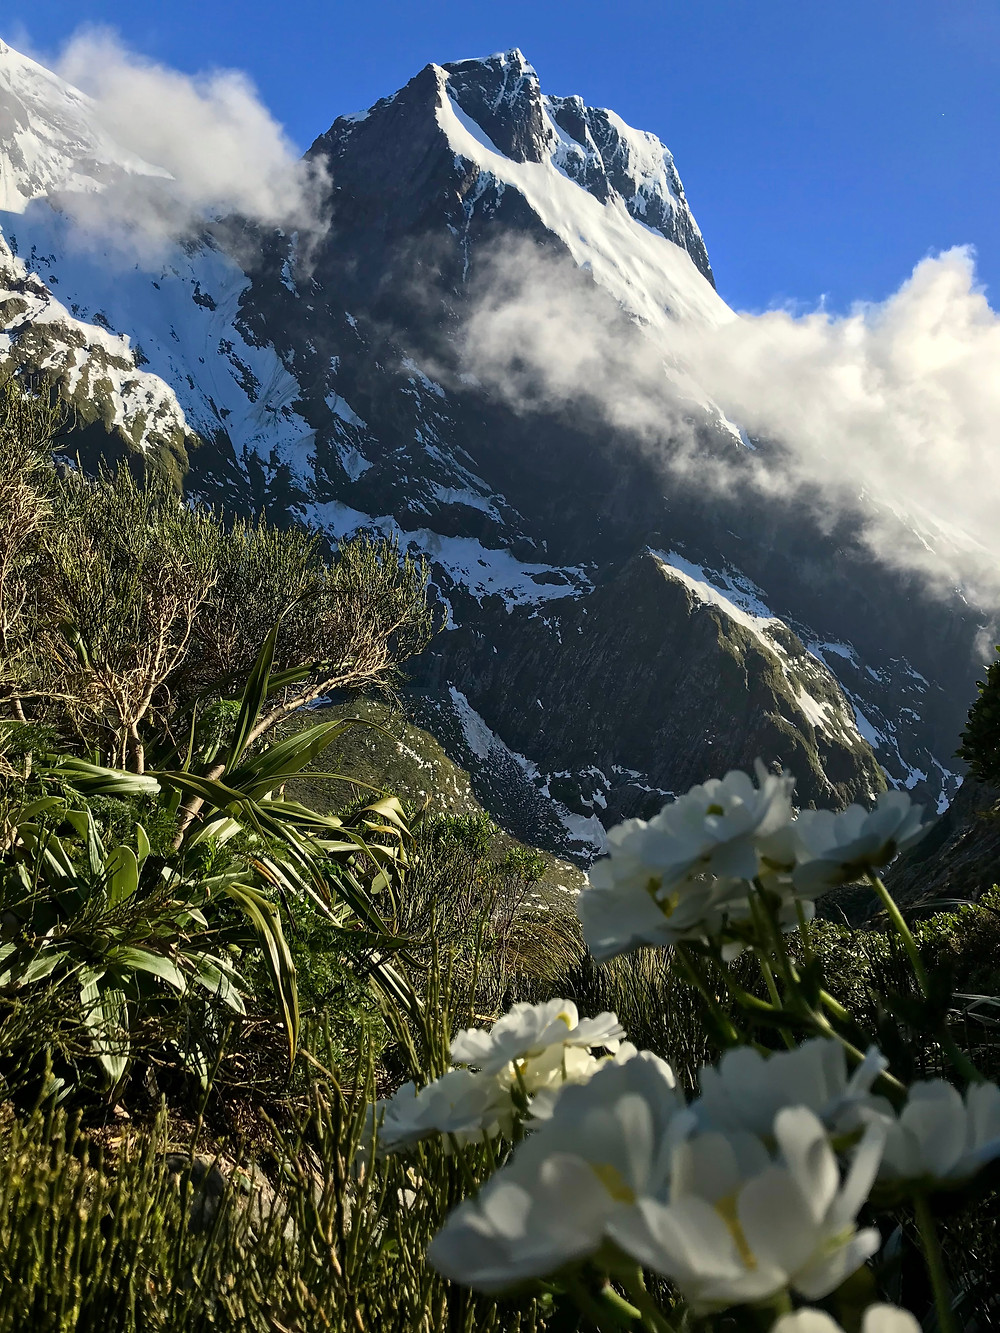 Mountain buttercups